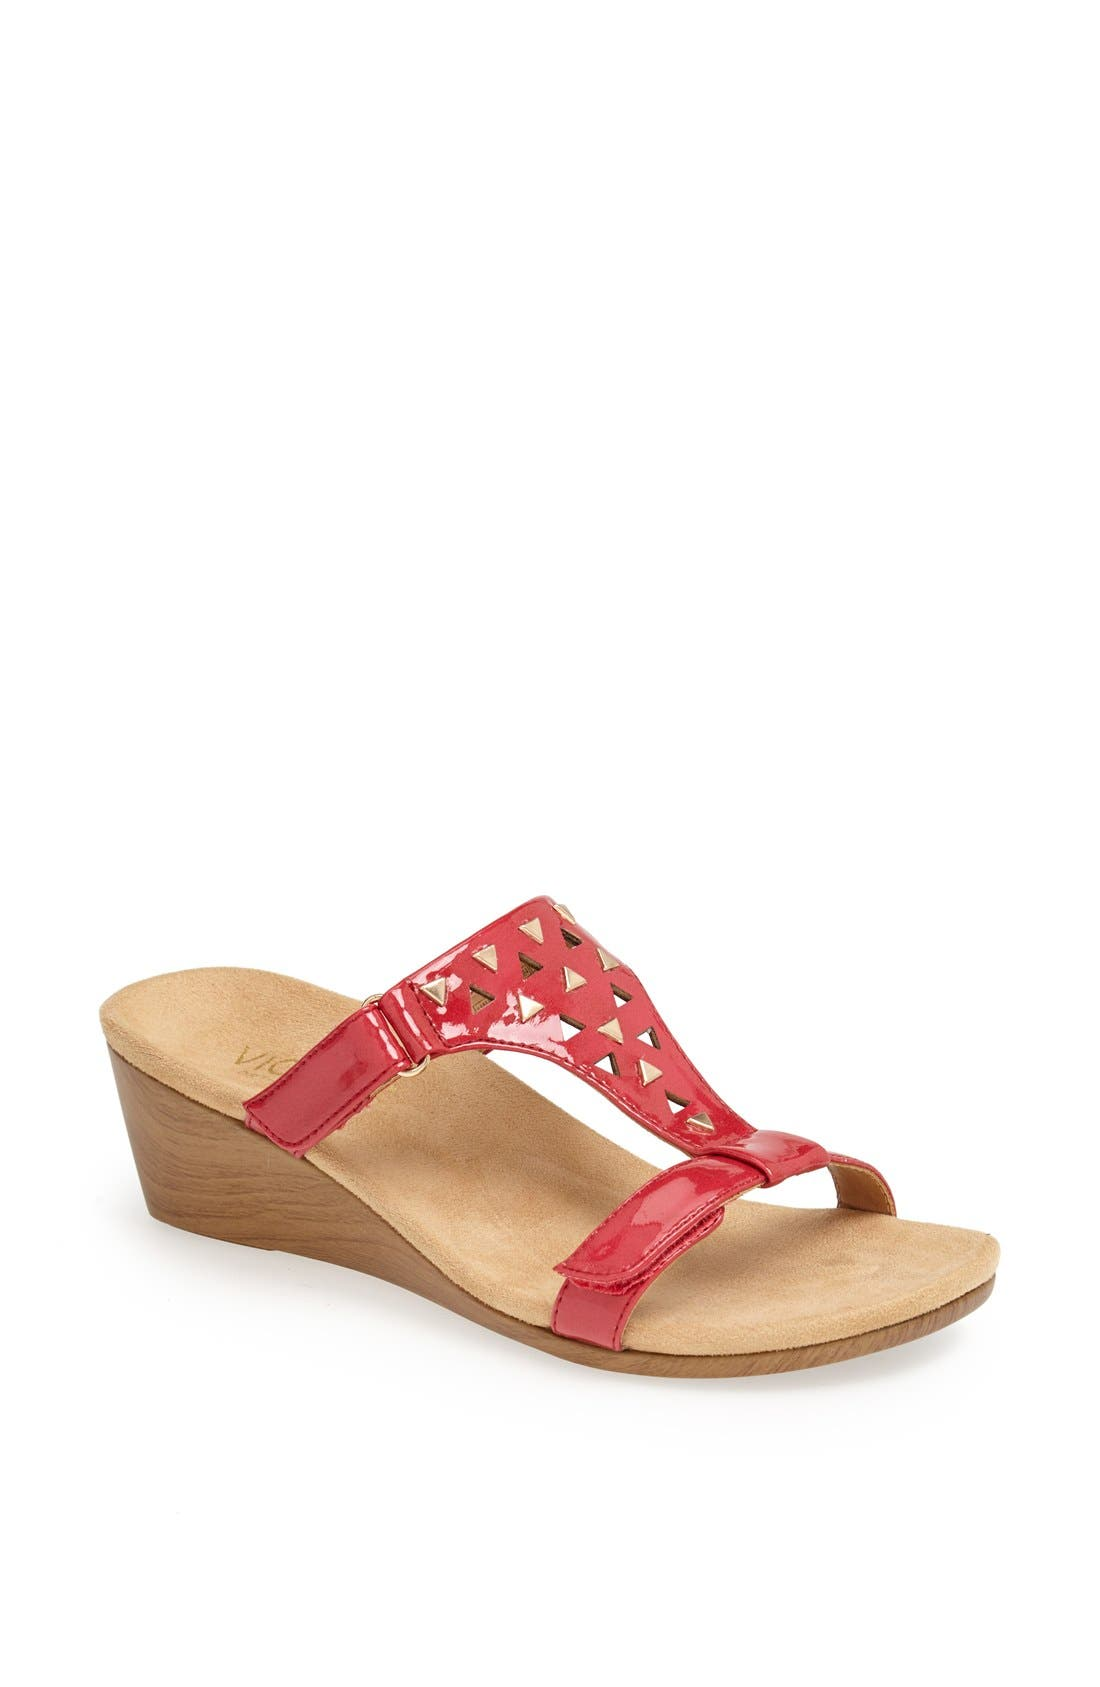 Alternate Image 1 Selected - Vionic 'Maggie' Geometric Cutout Wedge Sandal